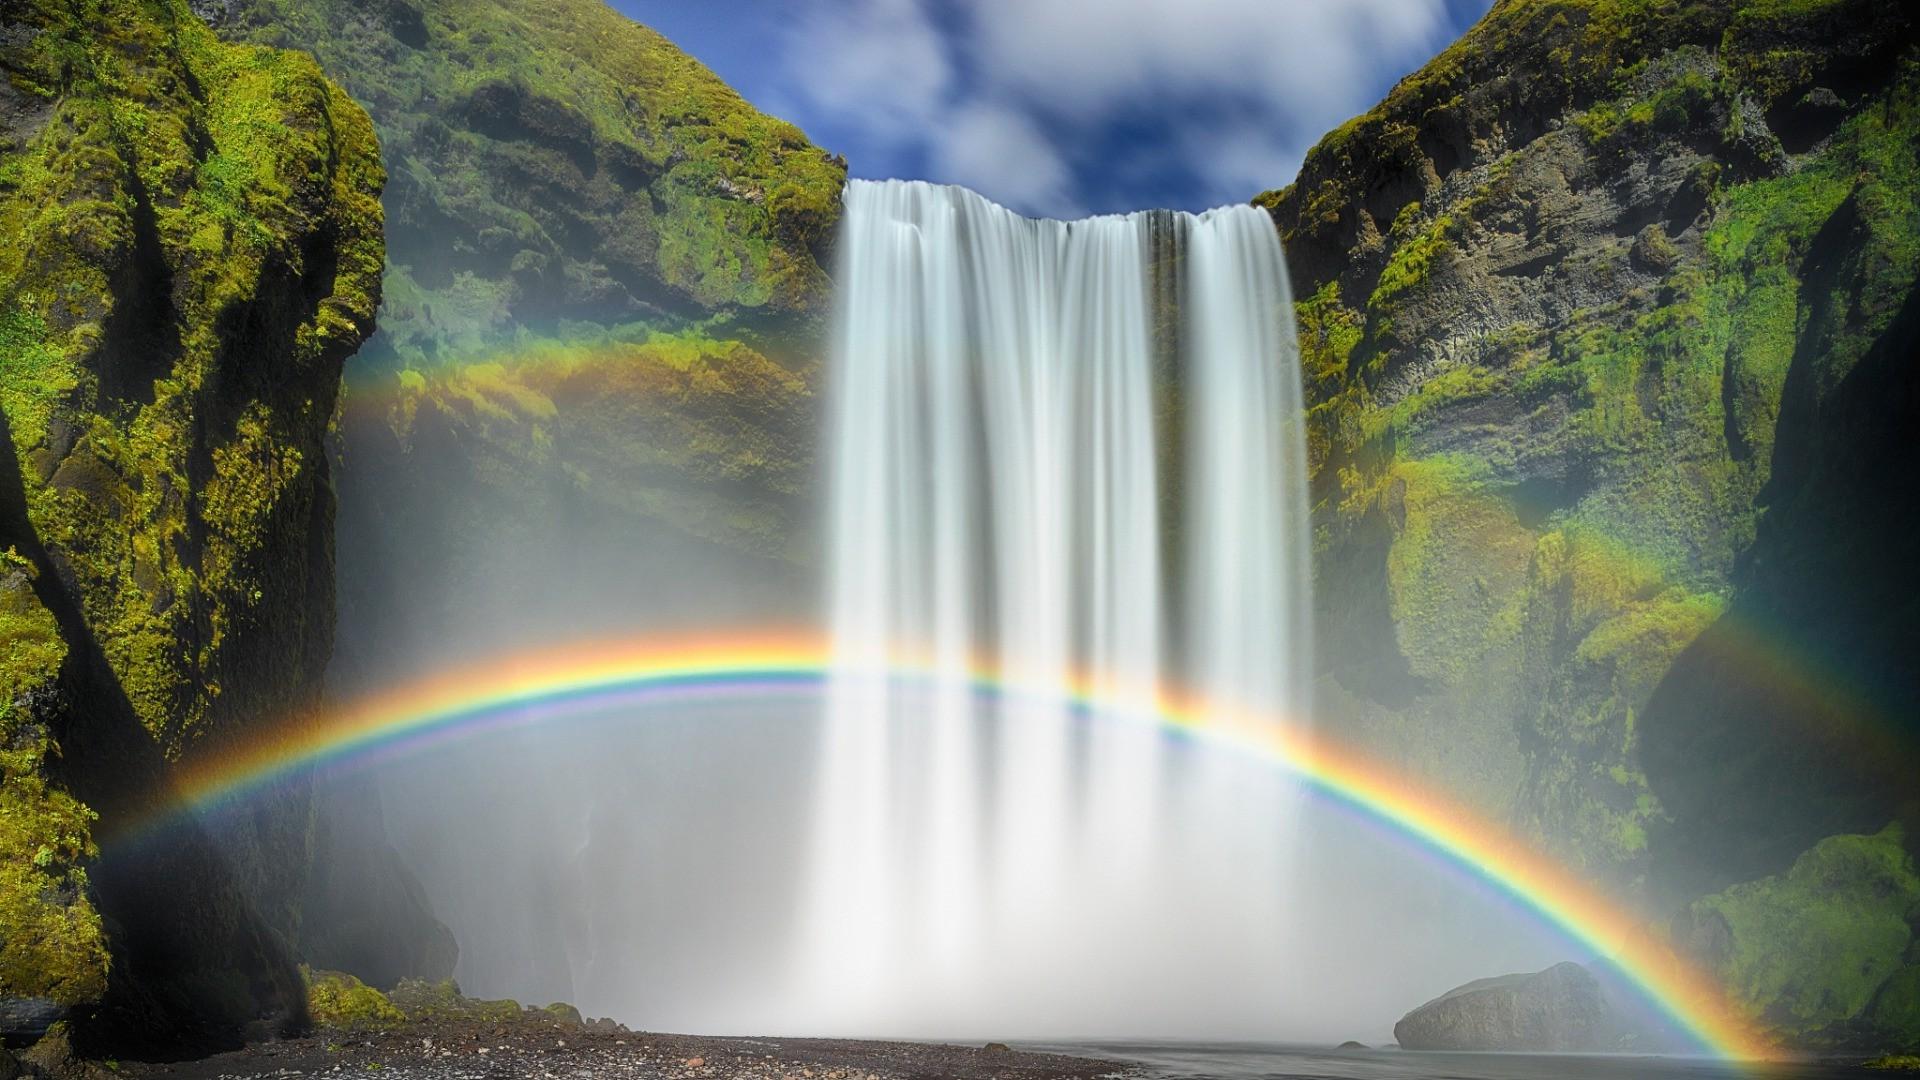 Niagara Falls Moving Wallpaper Nature Waterfall Rainbows Moss Long Exposure Iceland